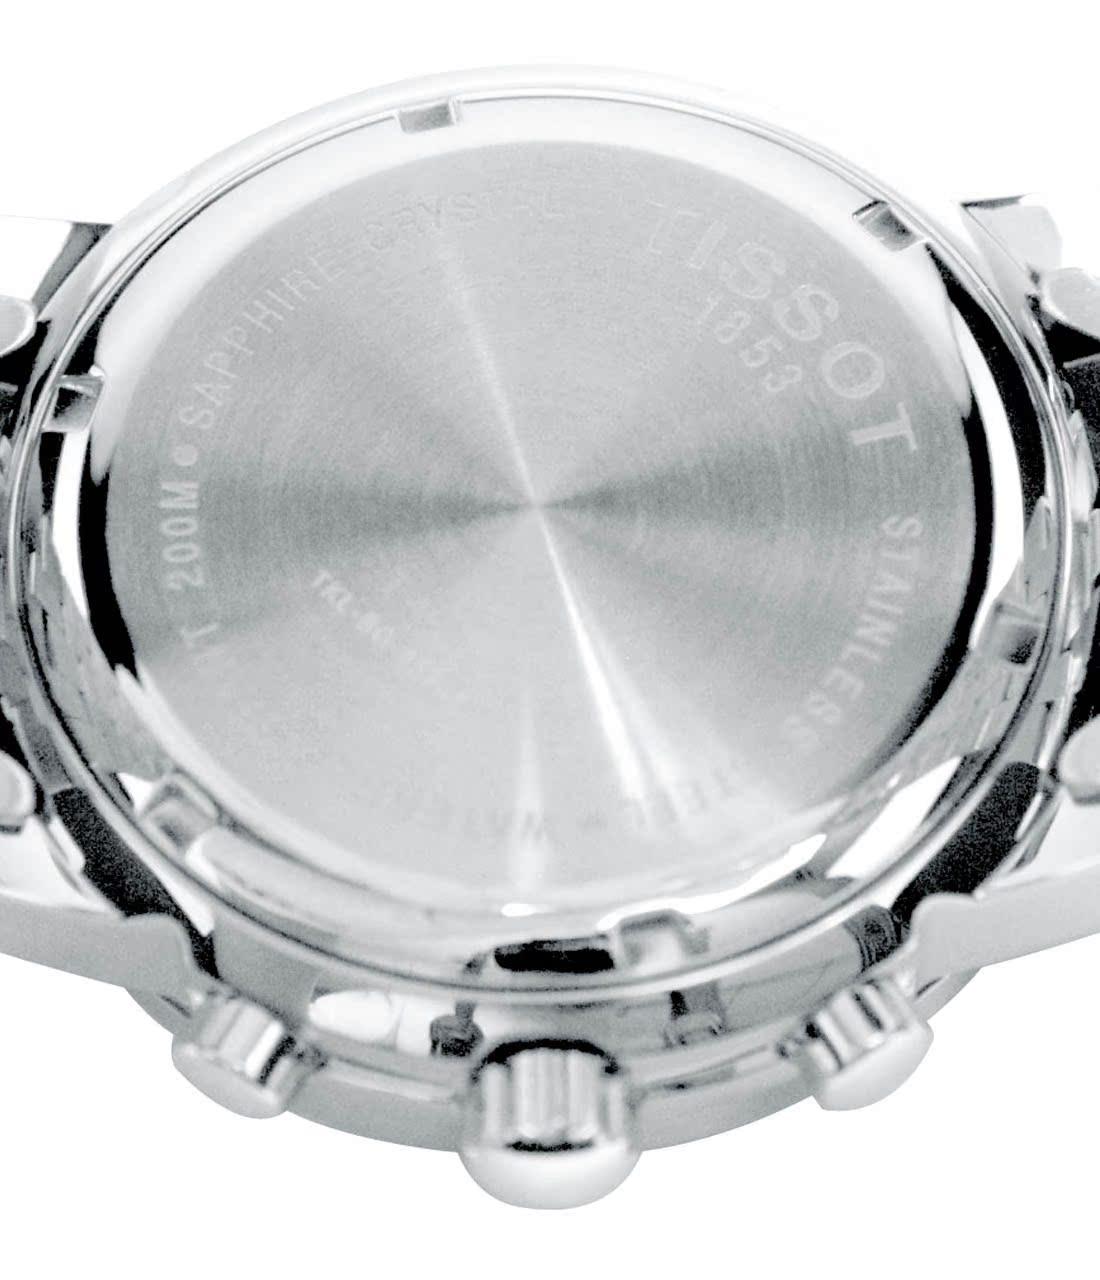 Часы Tissot PRC200 T17.1.526.52 Кварцевые часы Мужские Швейцария 2005